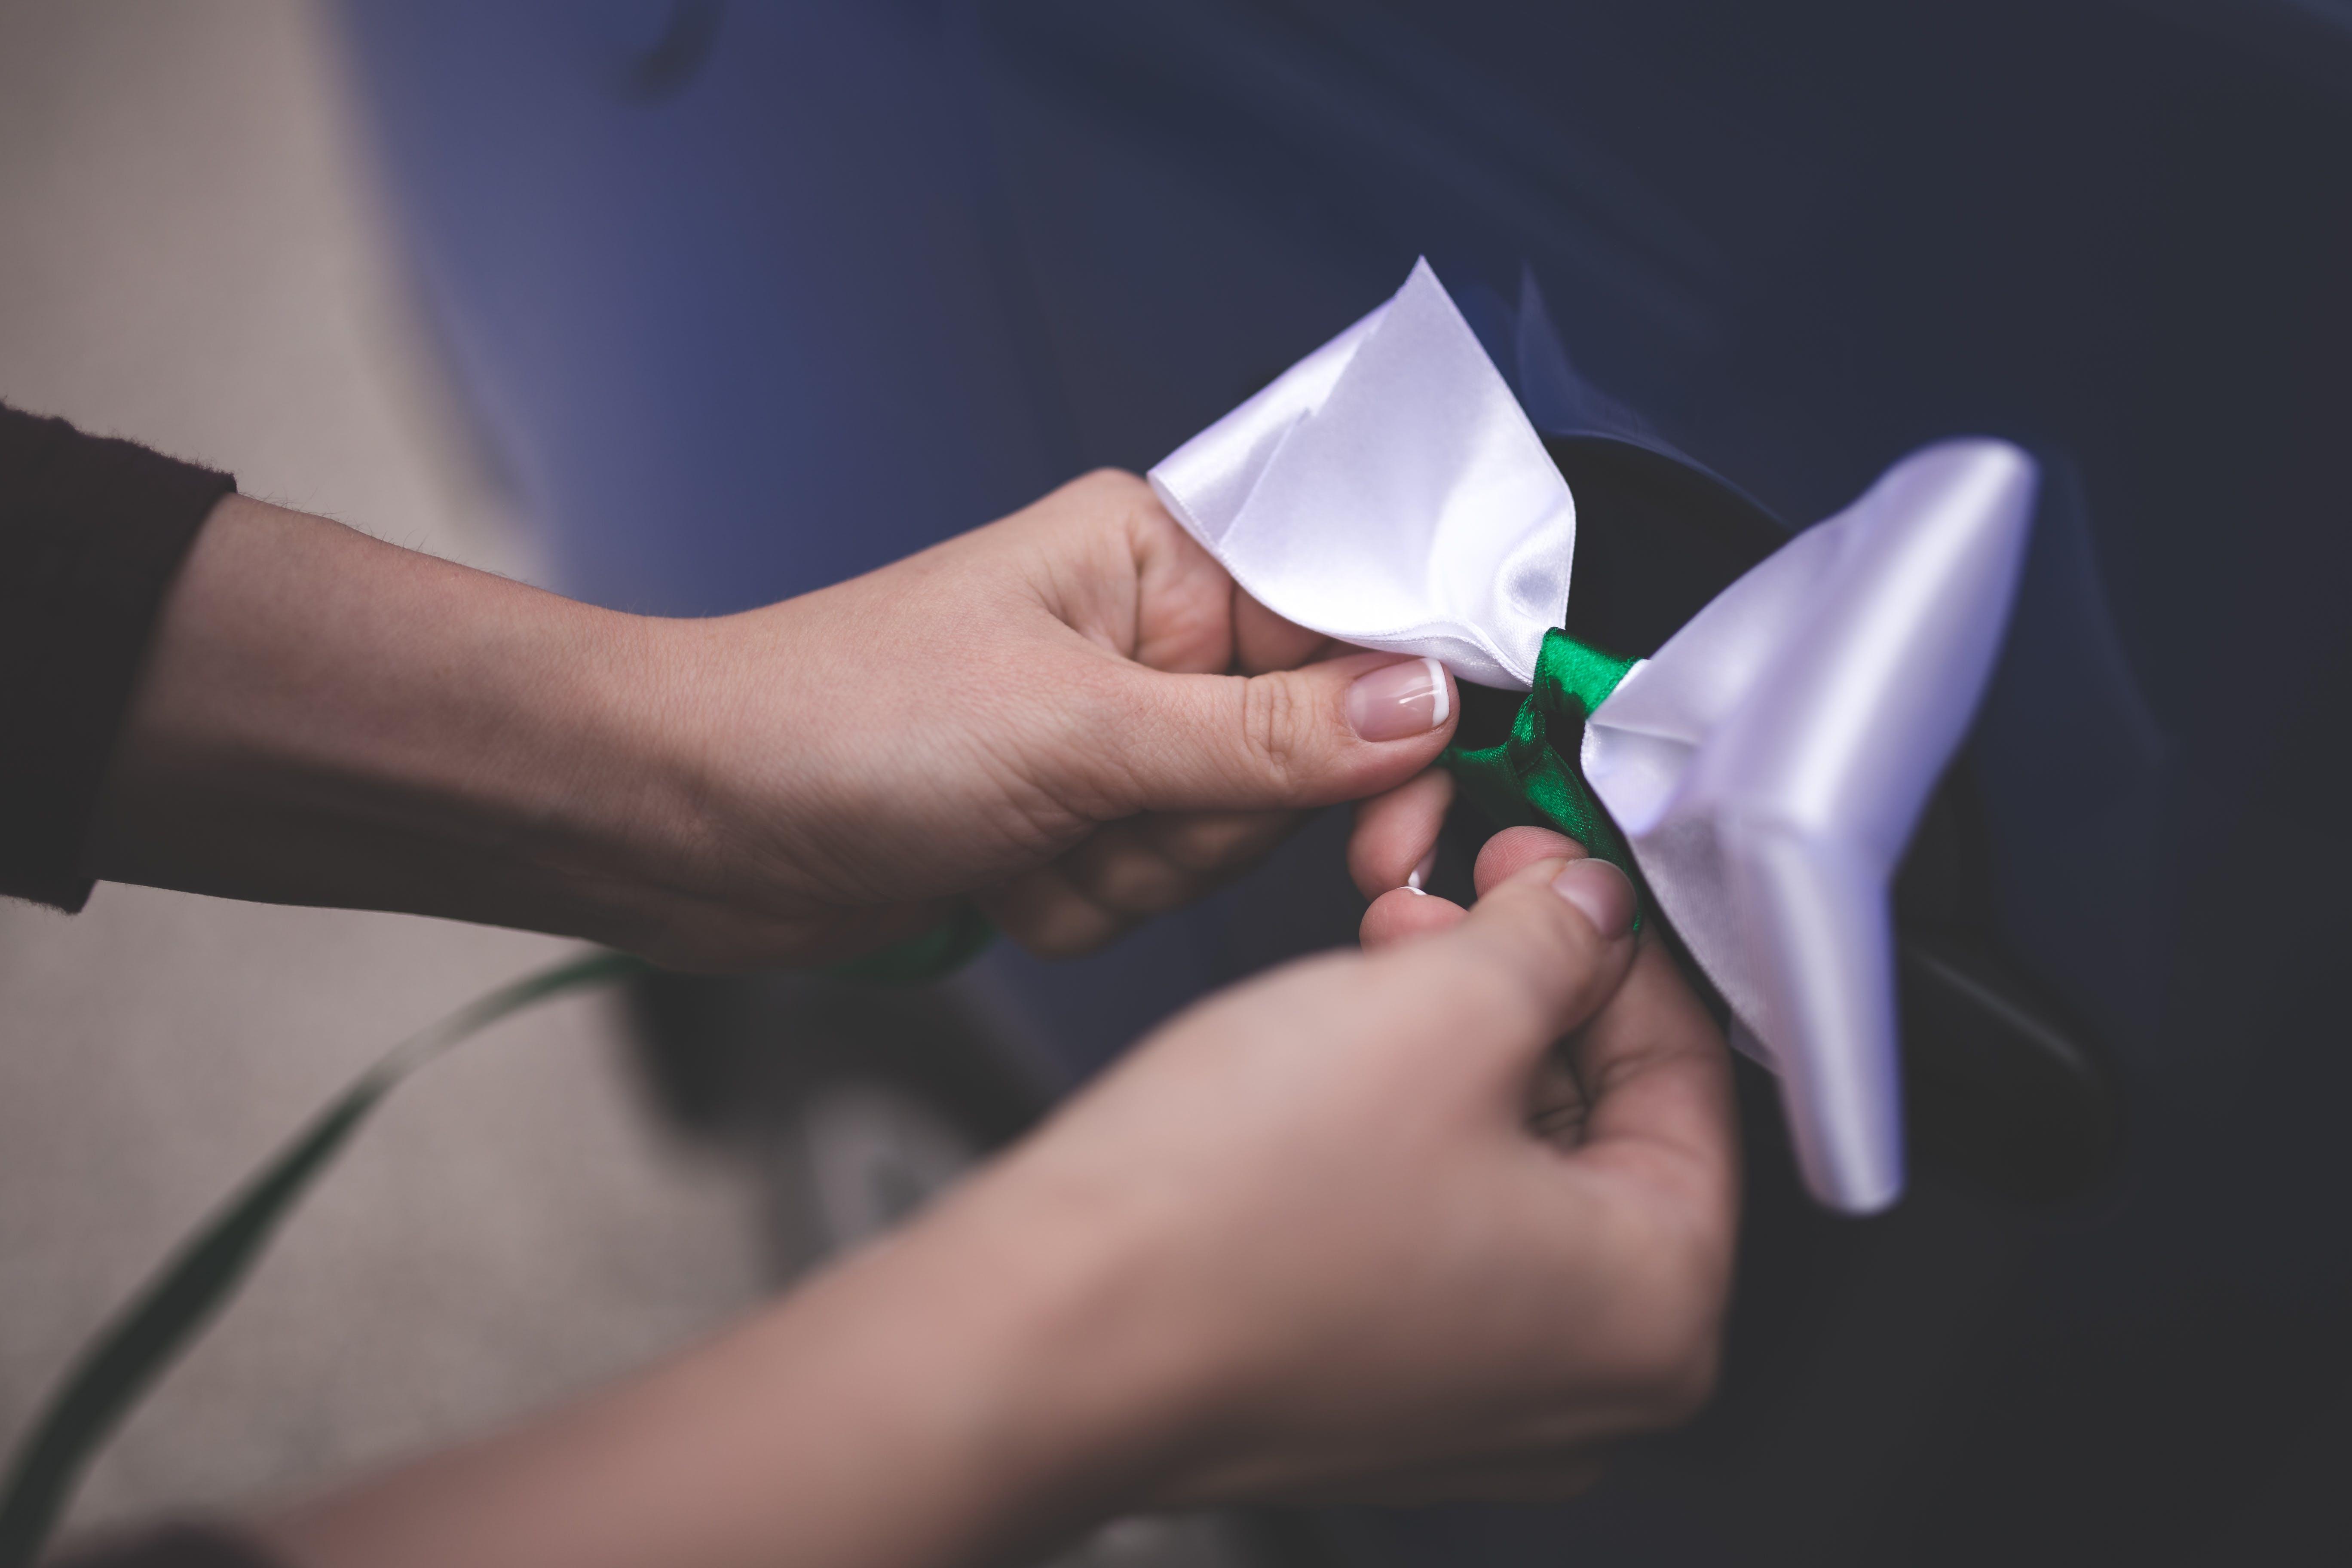 Woman tying a white bow